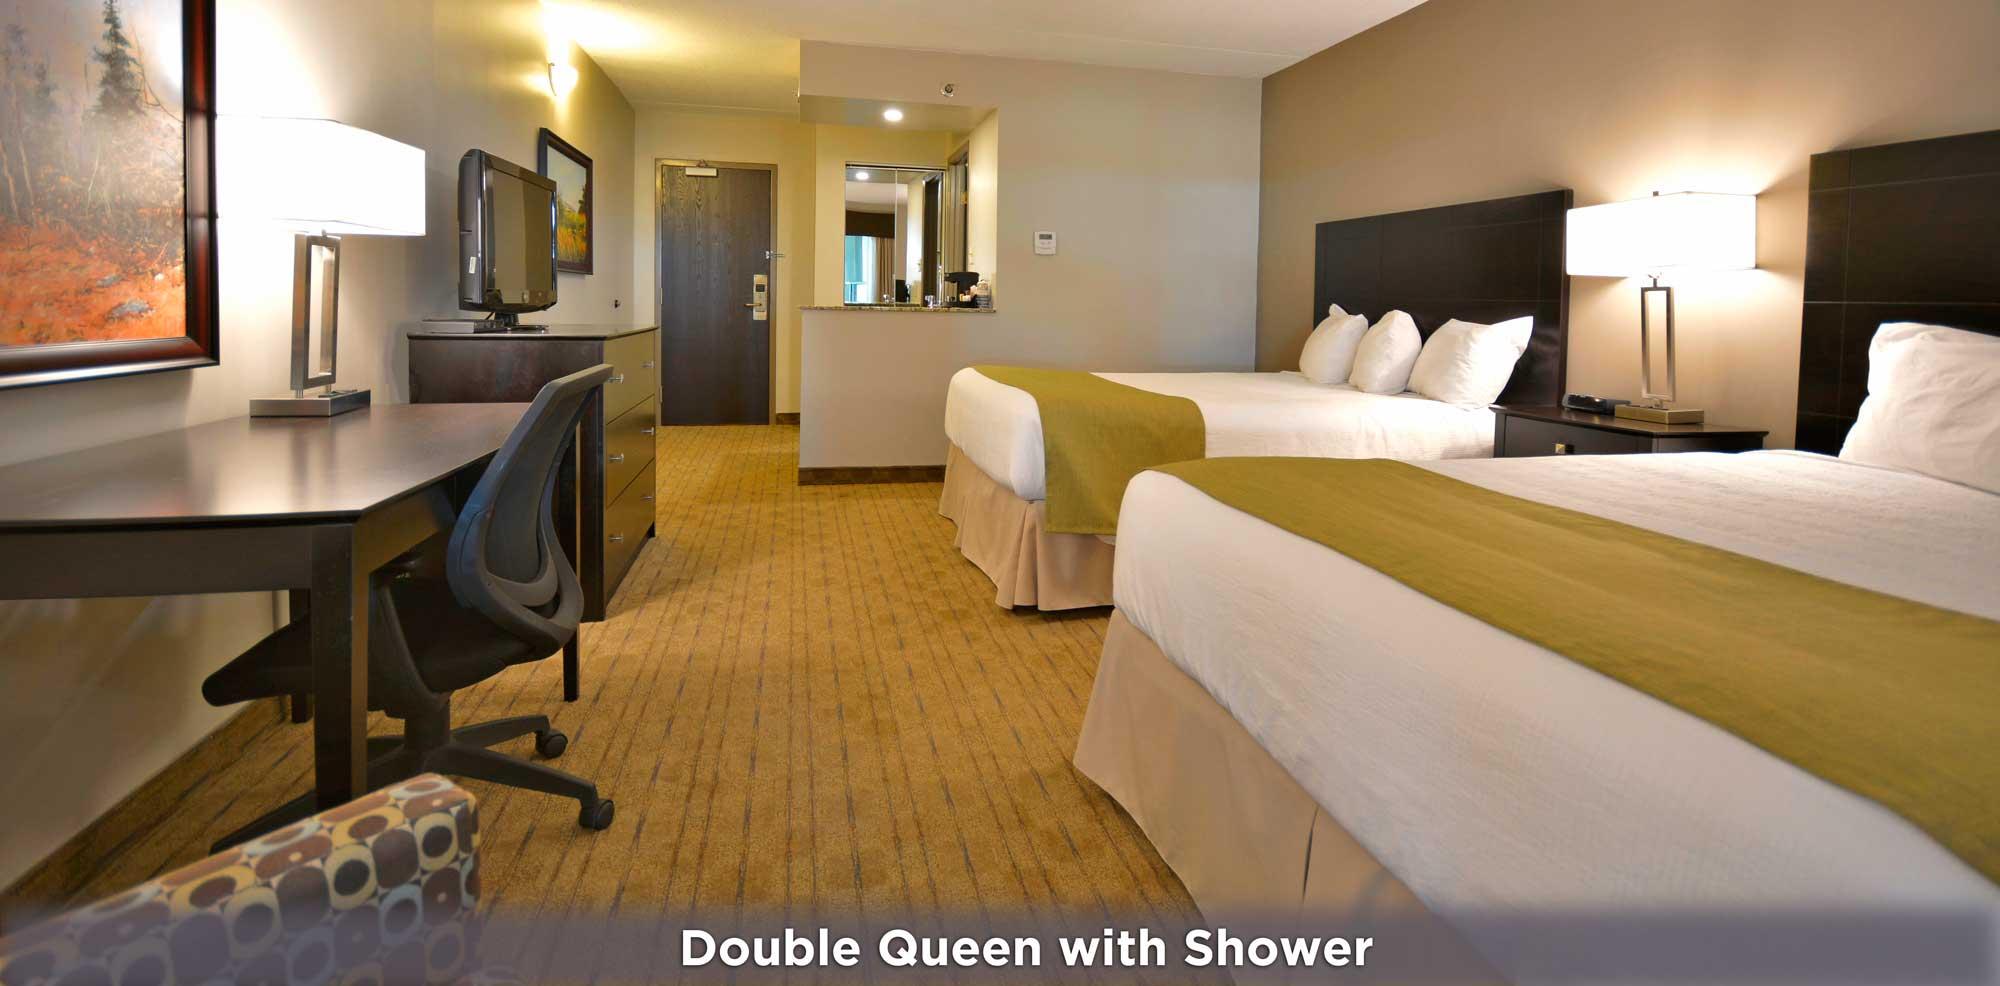 Rental Room And Board Pembroke On